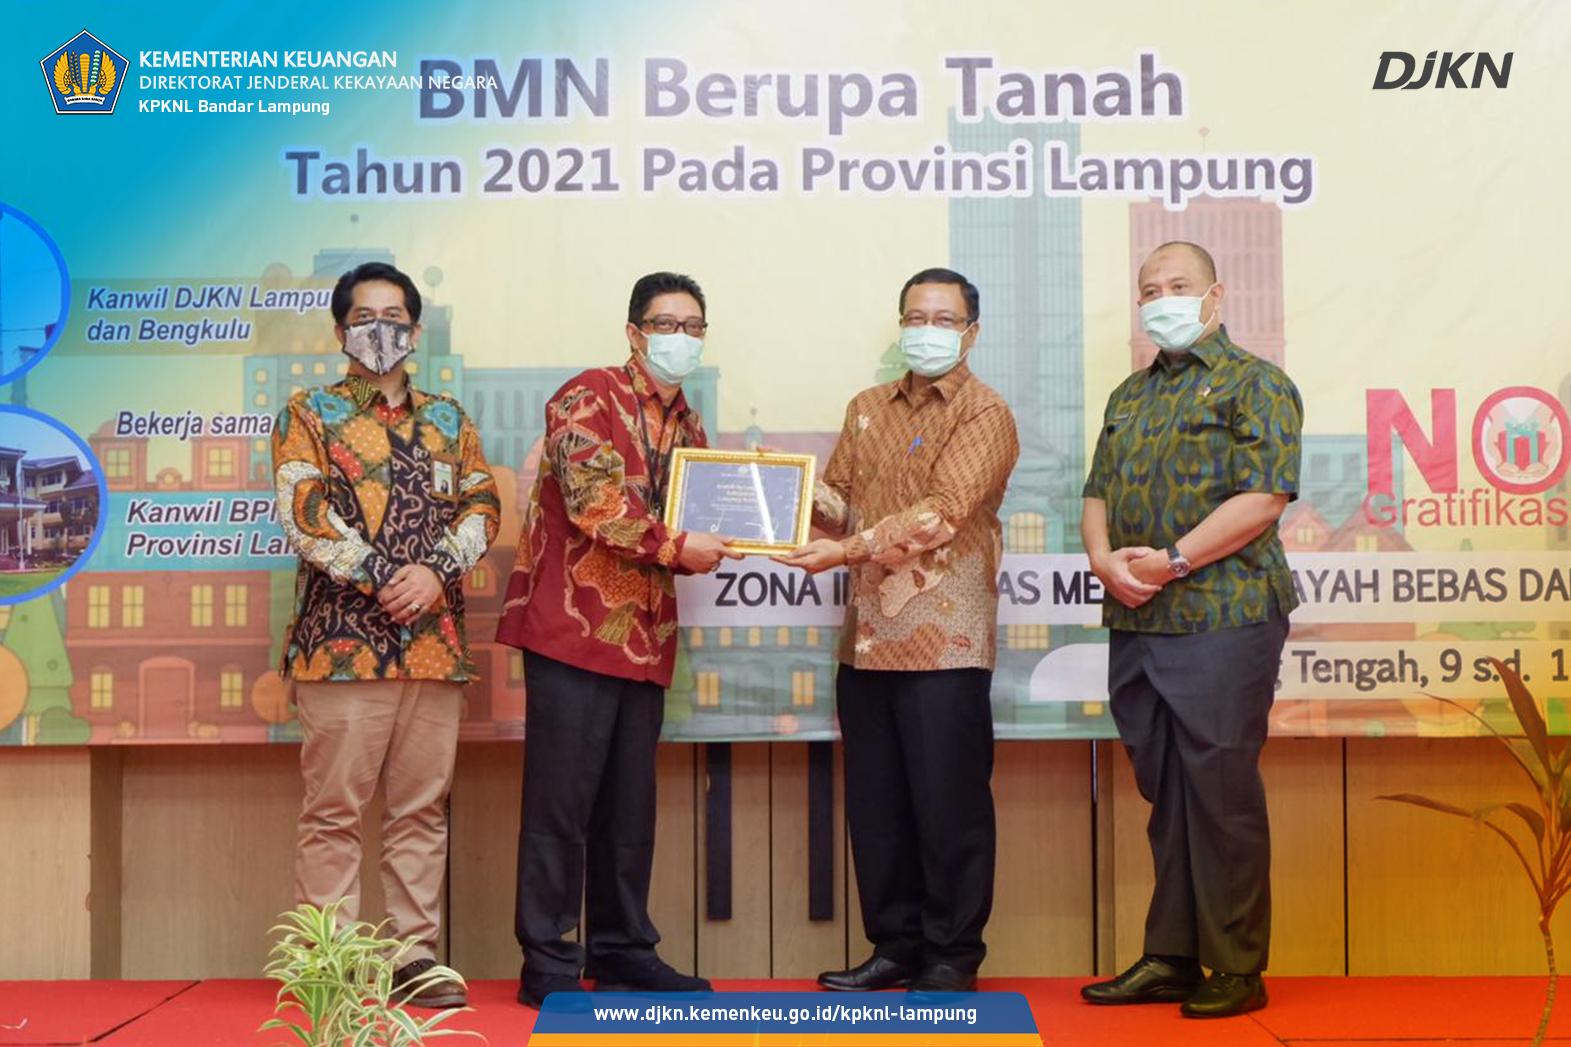 KPKNL Bandar Lampung Berhasil Sertipikatkan 1.299 Bidang Tanah Negara